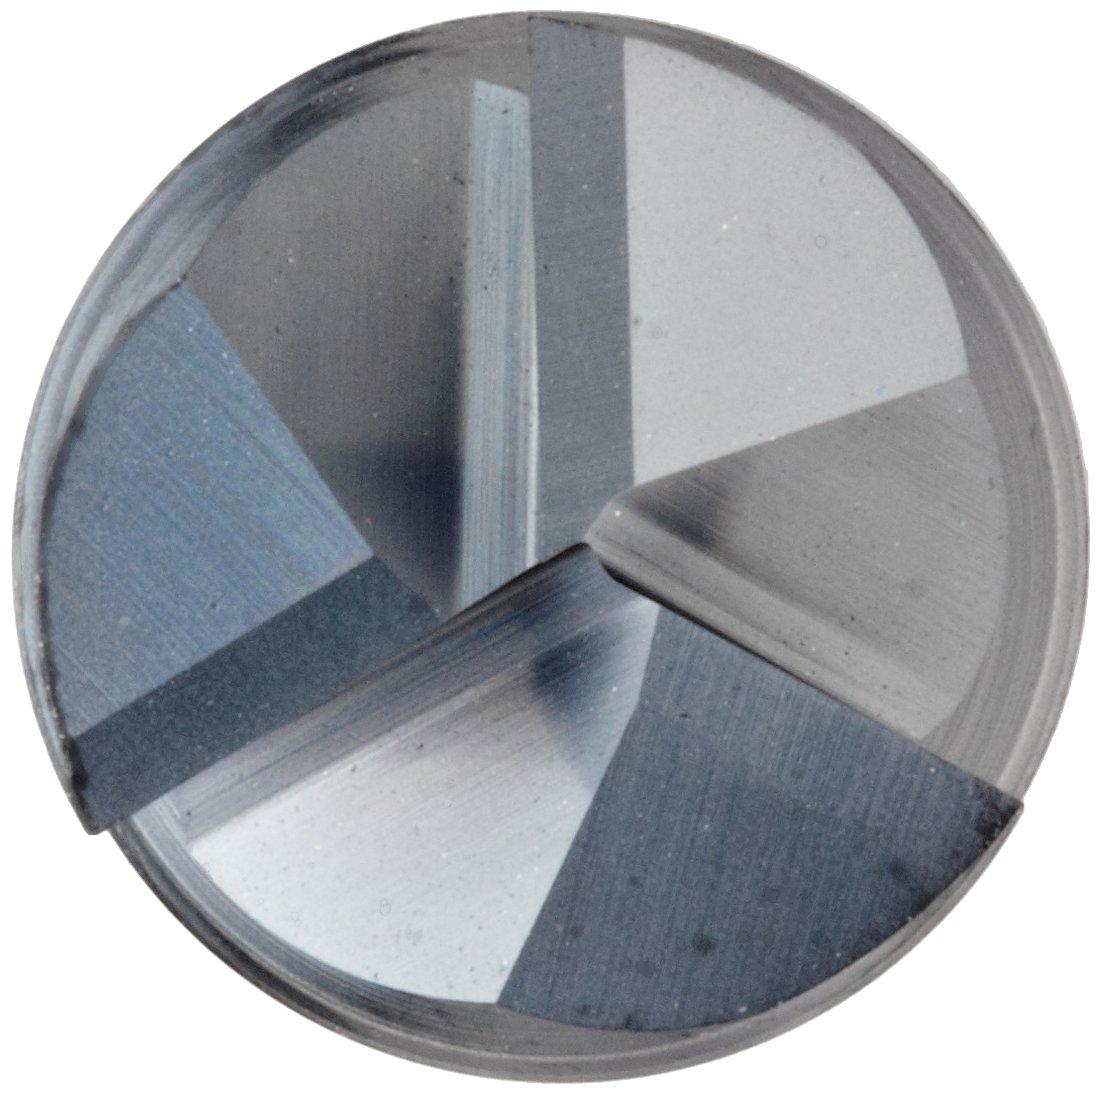 4 Overall Length 1 Cutting Diameter AlTiN Monolayer Finish 3 Flutes 1 Shank Diameter Finishing Cut Melin Tool EMG60 Carbide Square Nose End Mill 60 Deg Helix